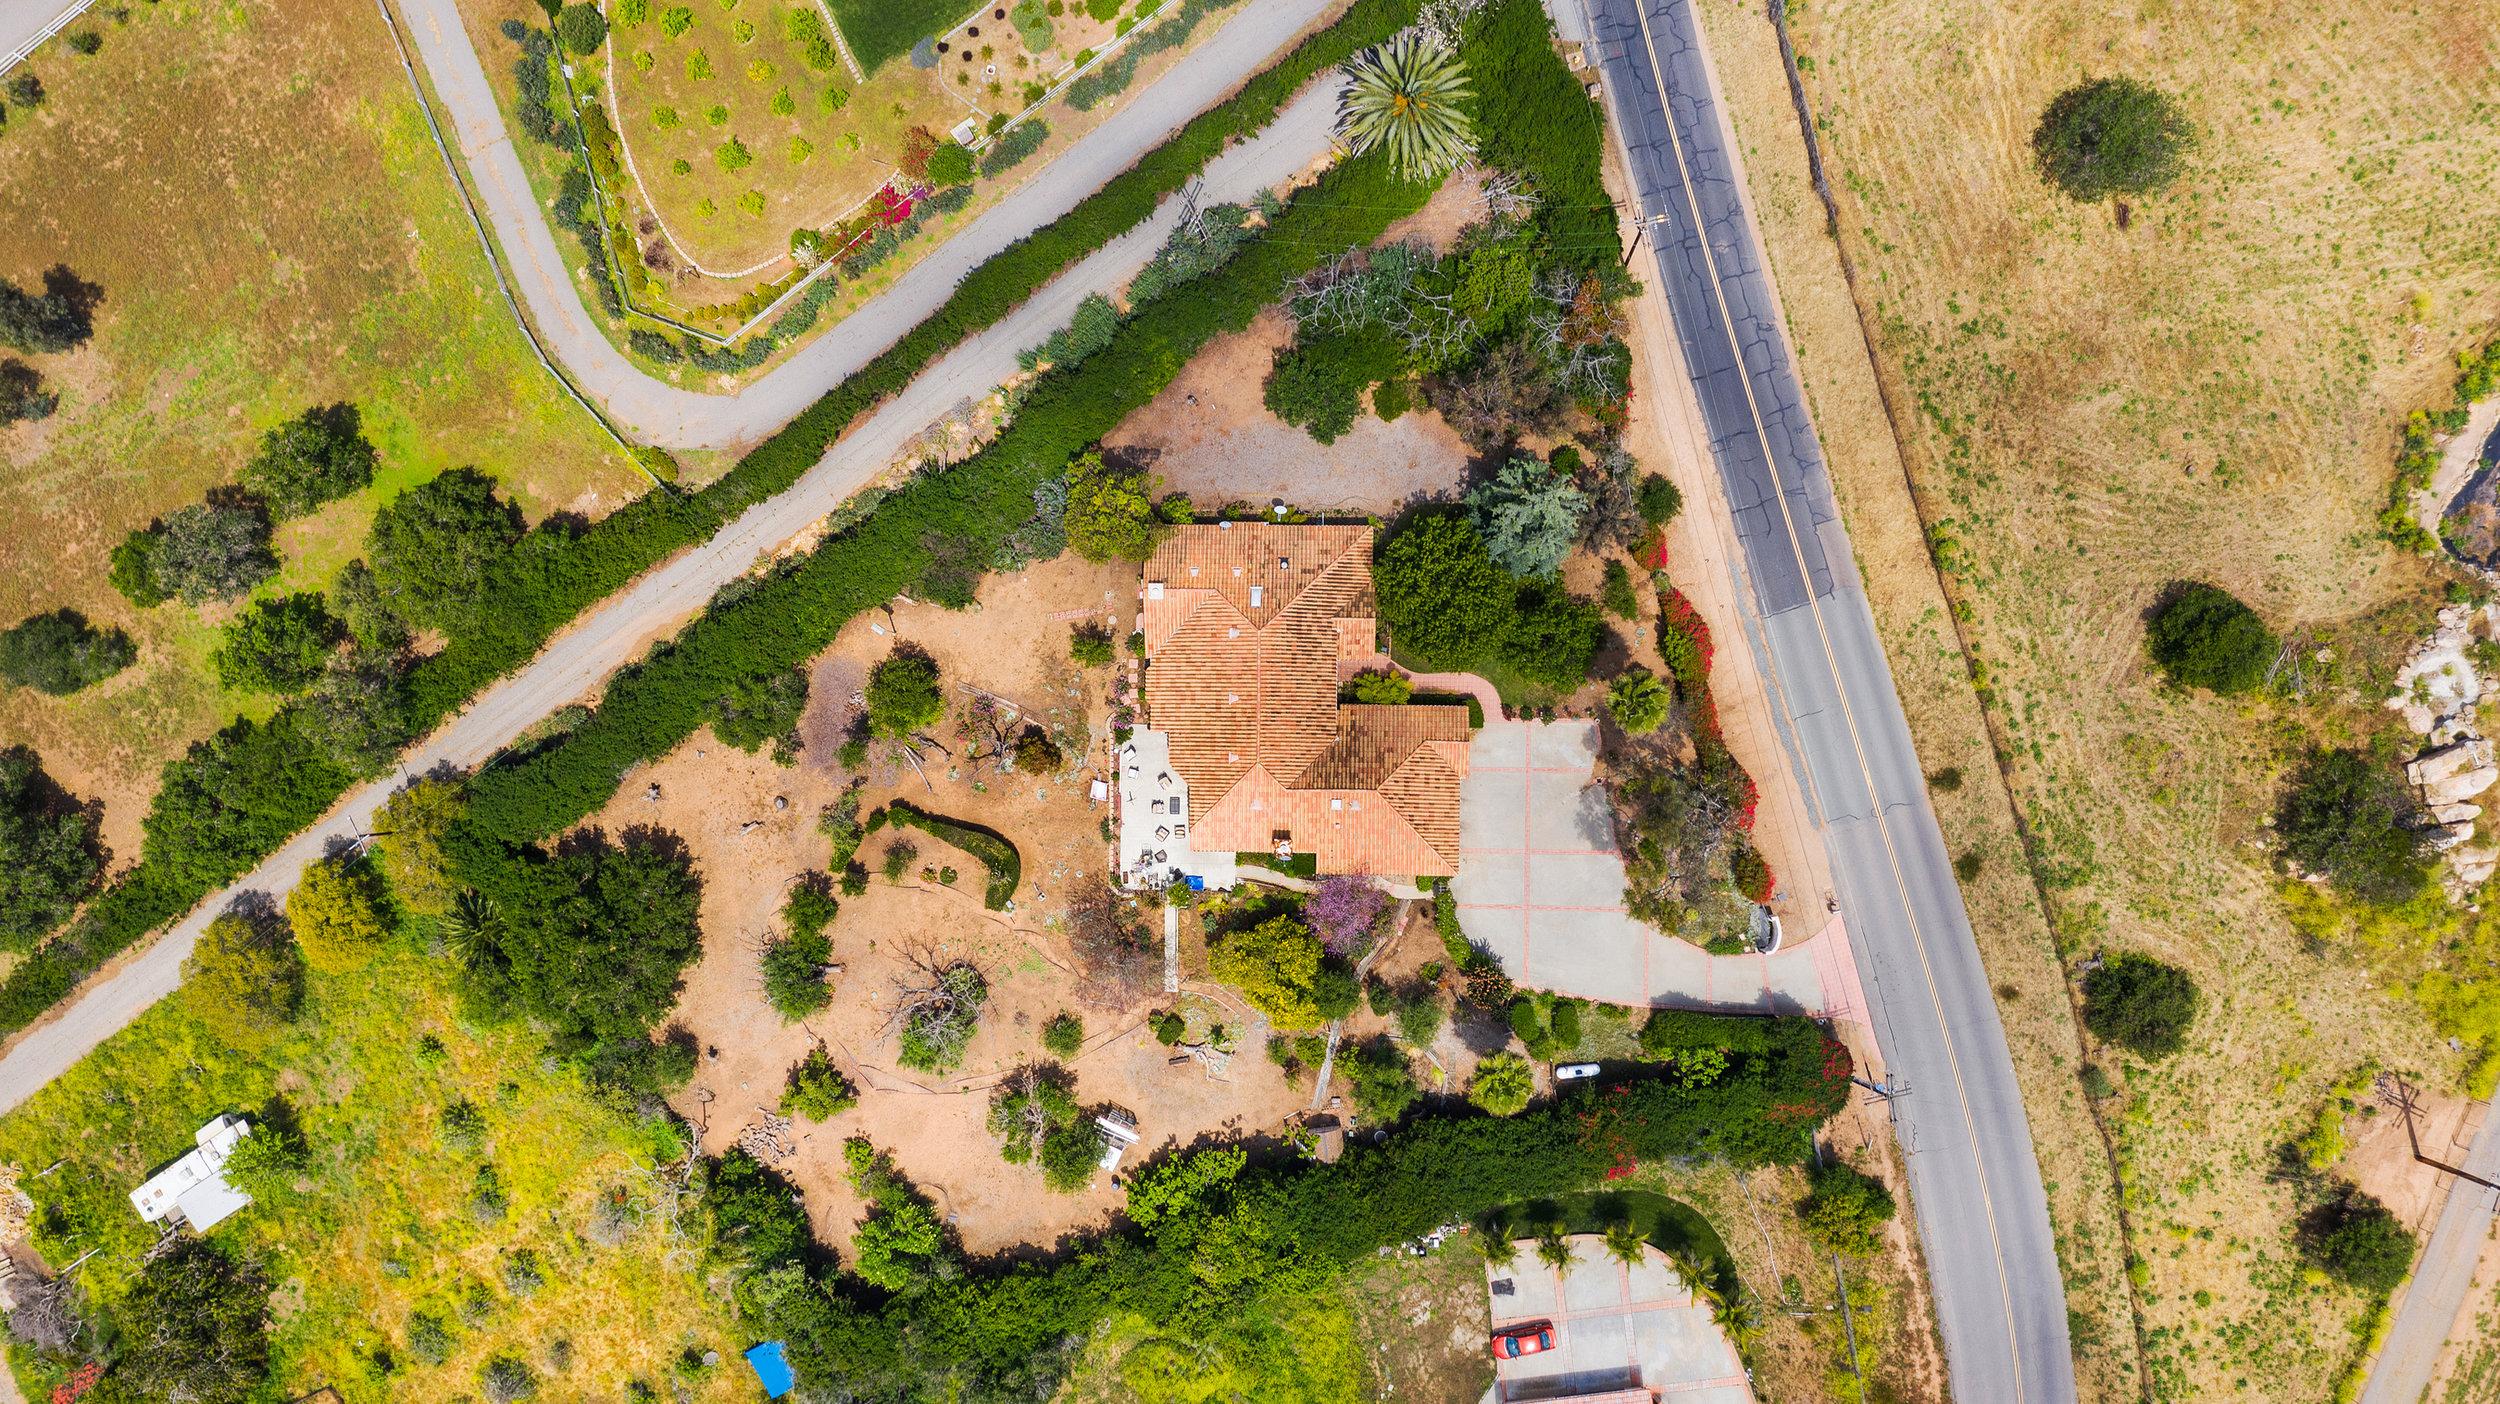 037_Aerial Property View.jpg